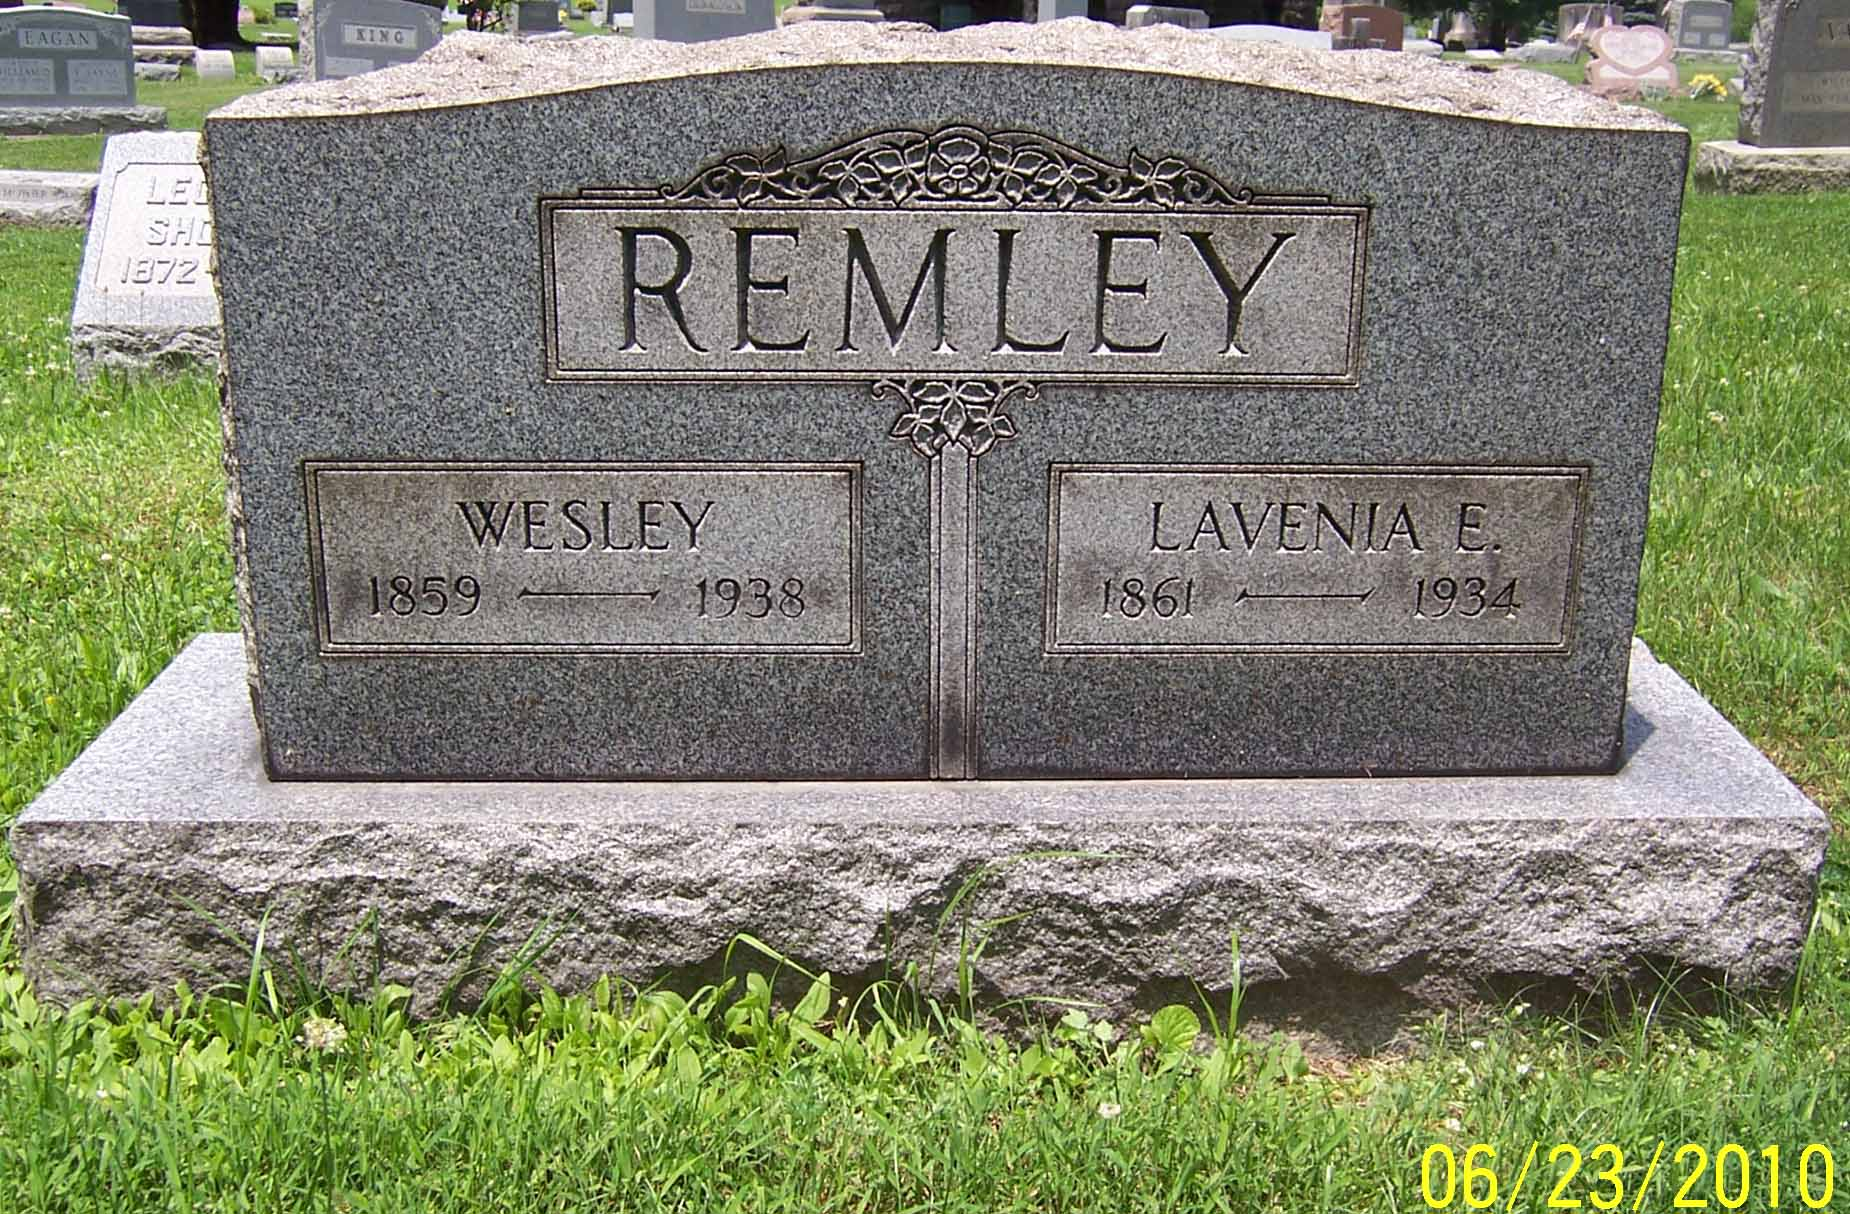 Daniel Remley